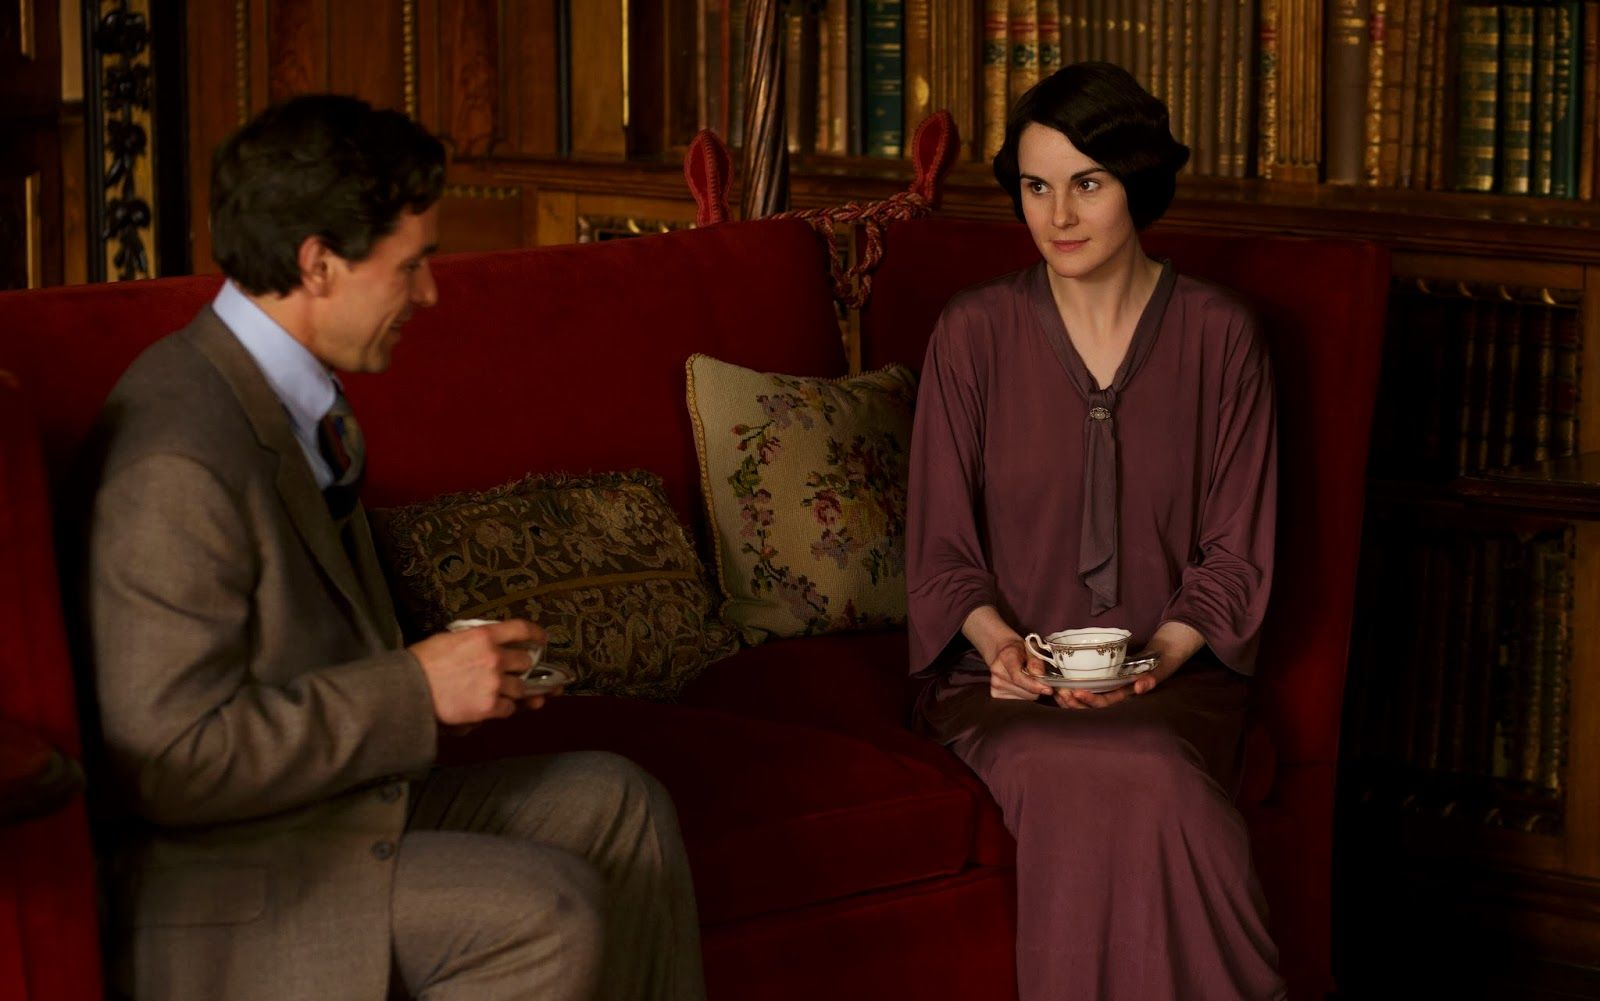 Watch Downton Abbey Season 4 Episode 7 Online Downton Abbey Watch Downton Abbey Downton Abbey Costumes